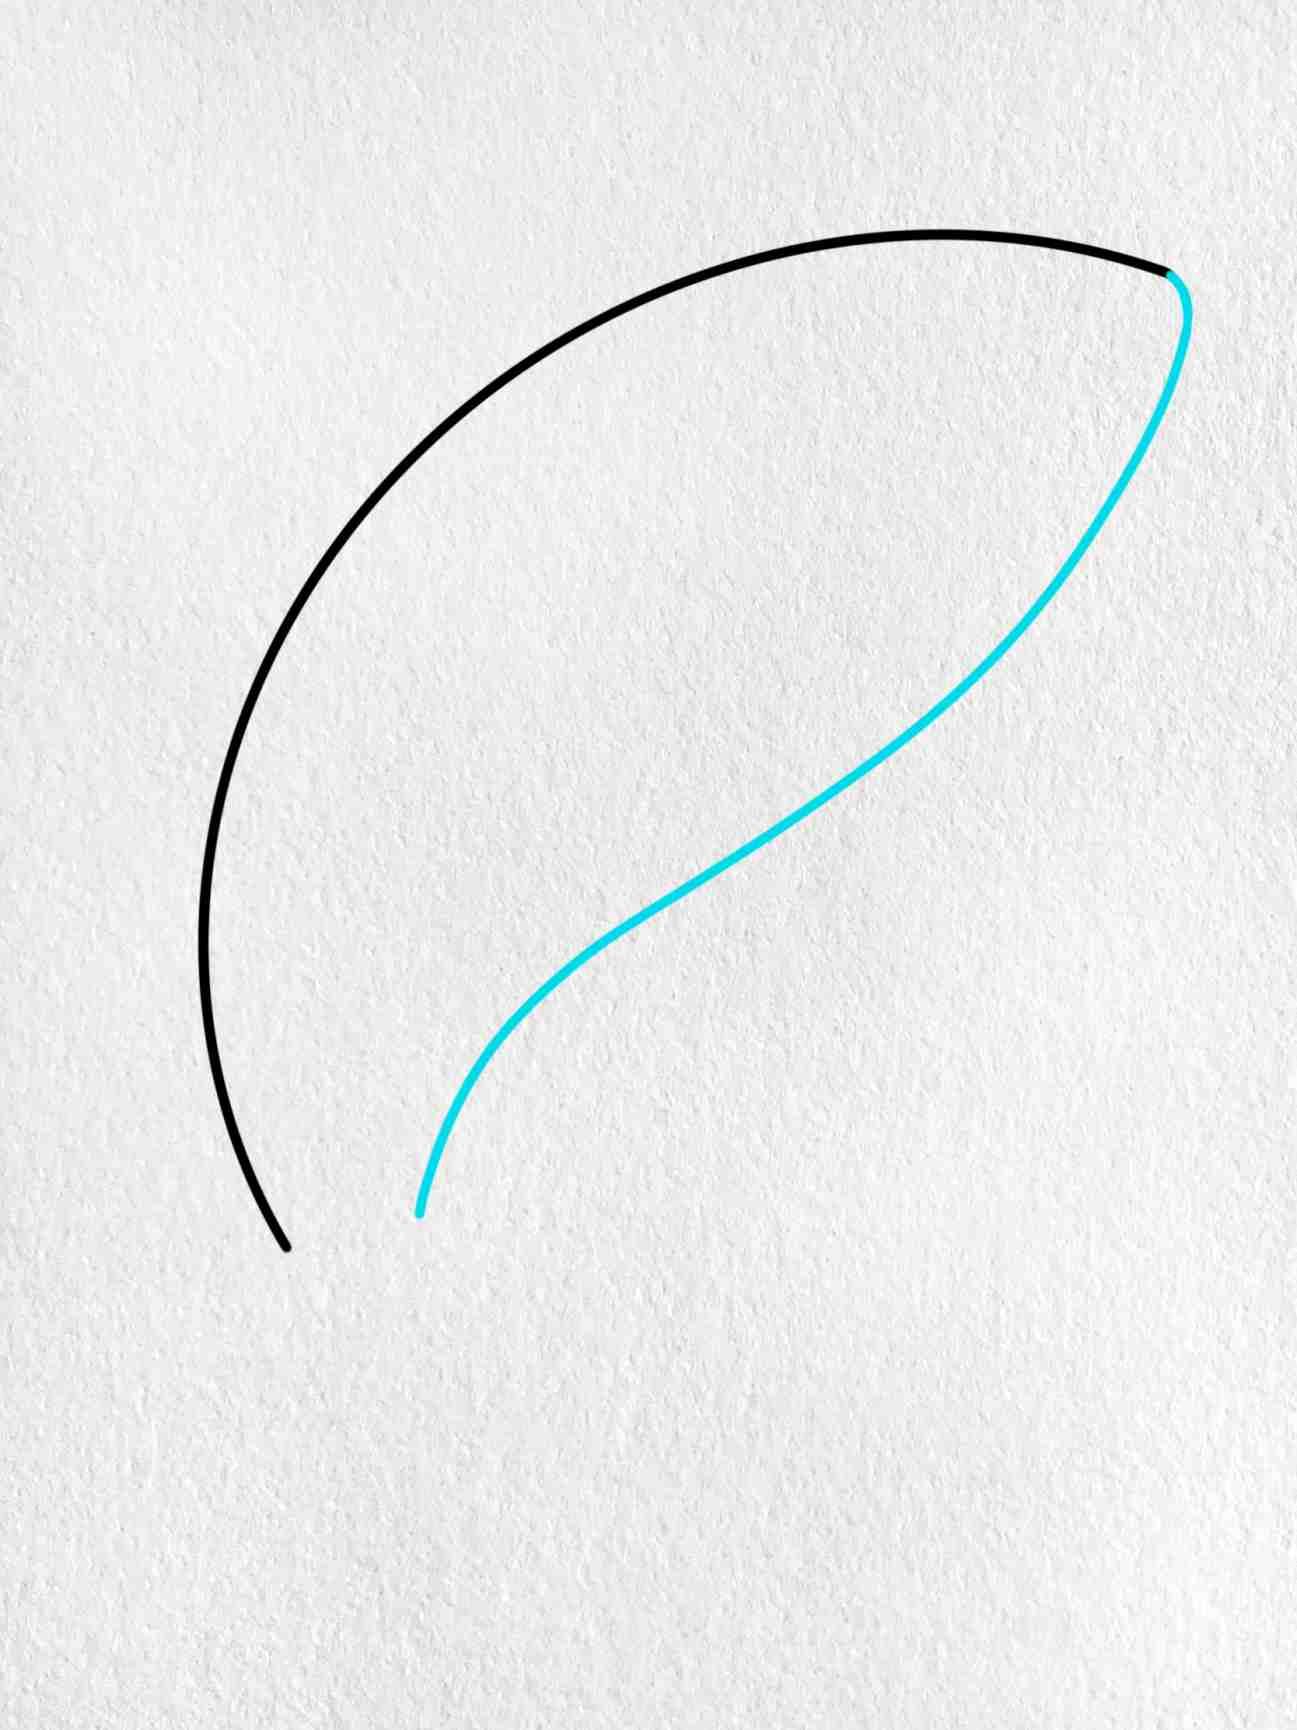 Shark Cartoon Drawing: Step 2